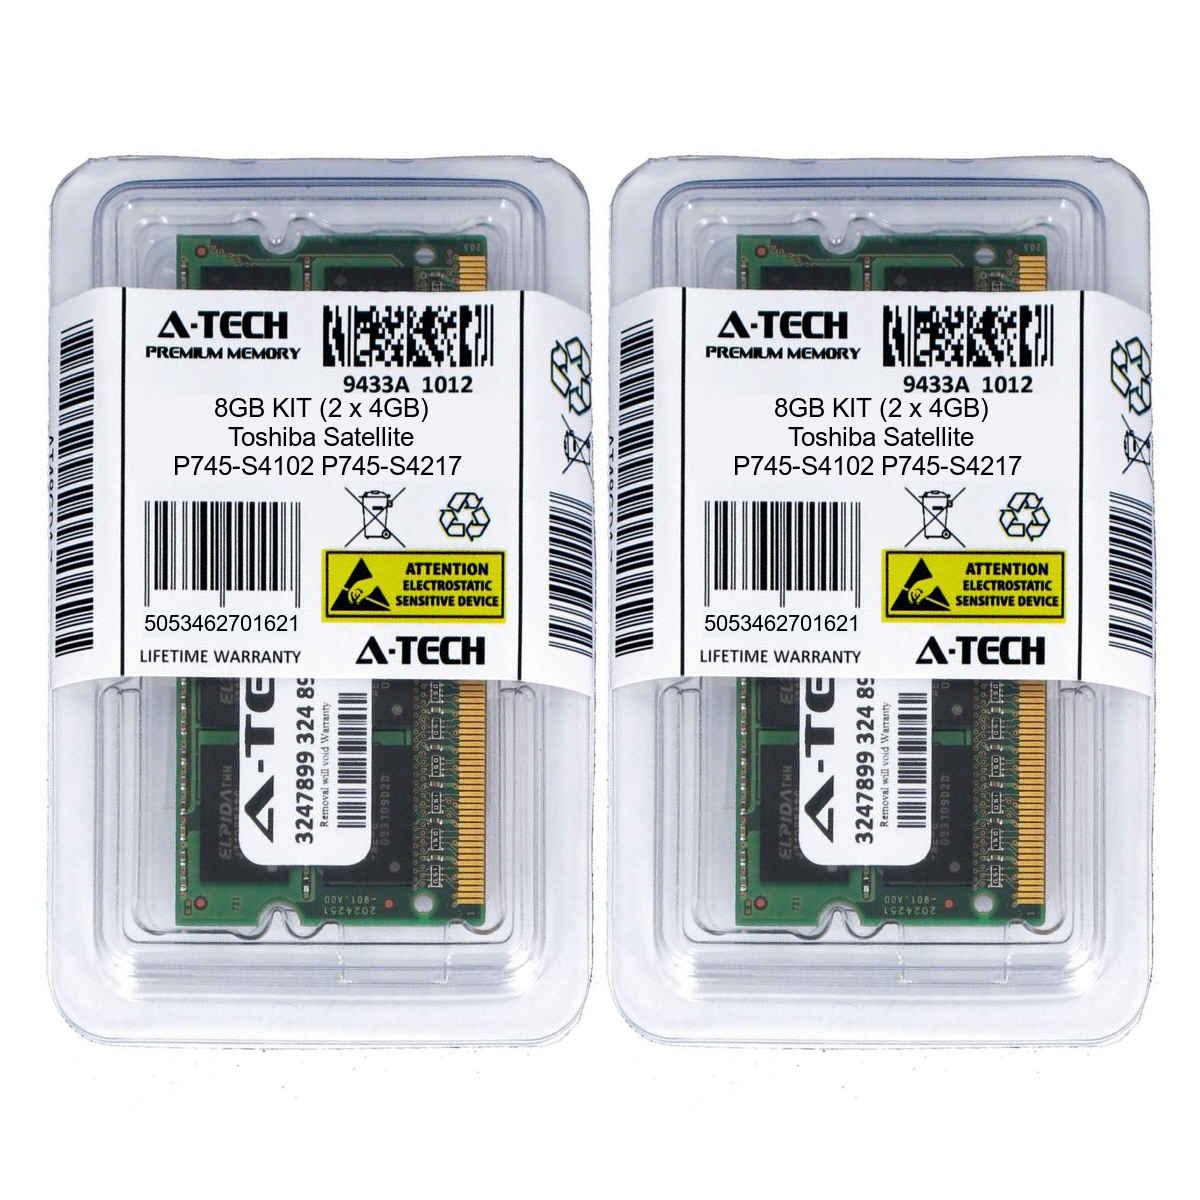 8GB KIT 2 x 4GB Toshiba Satellite P745-S4102 P745-S4217 P745-S4250 Ram Memory